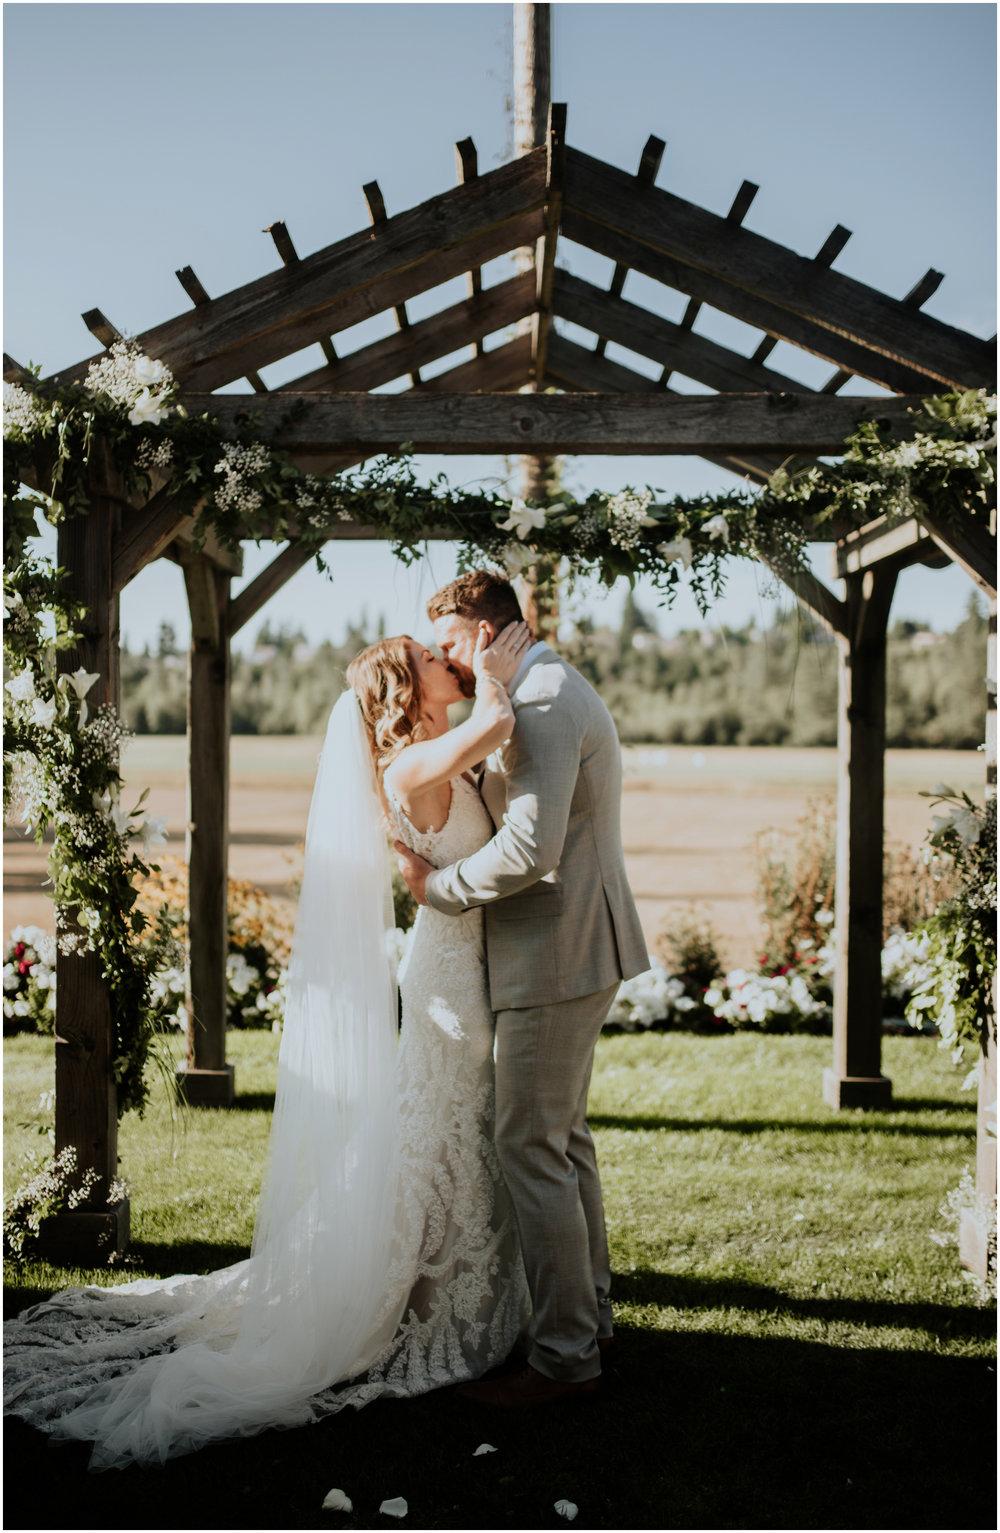 mona-and-matthew-the-kelley-farm-wedding-seattle-washington-wedding-photographer-85.jpg